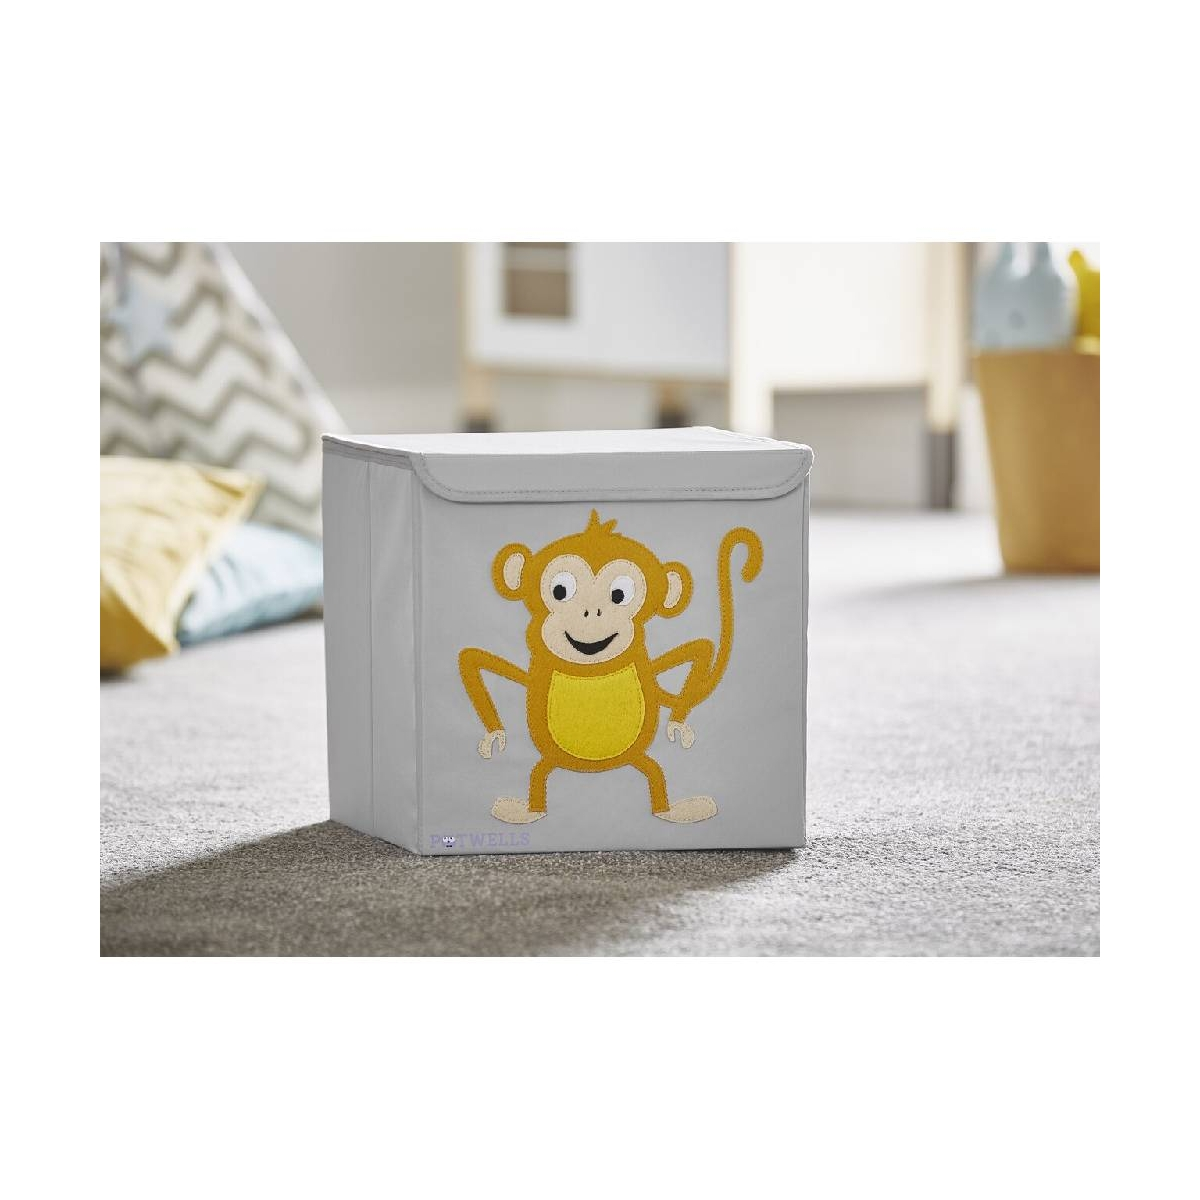 Potwells Monkey Storage Box (2021)